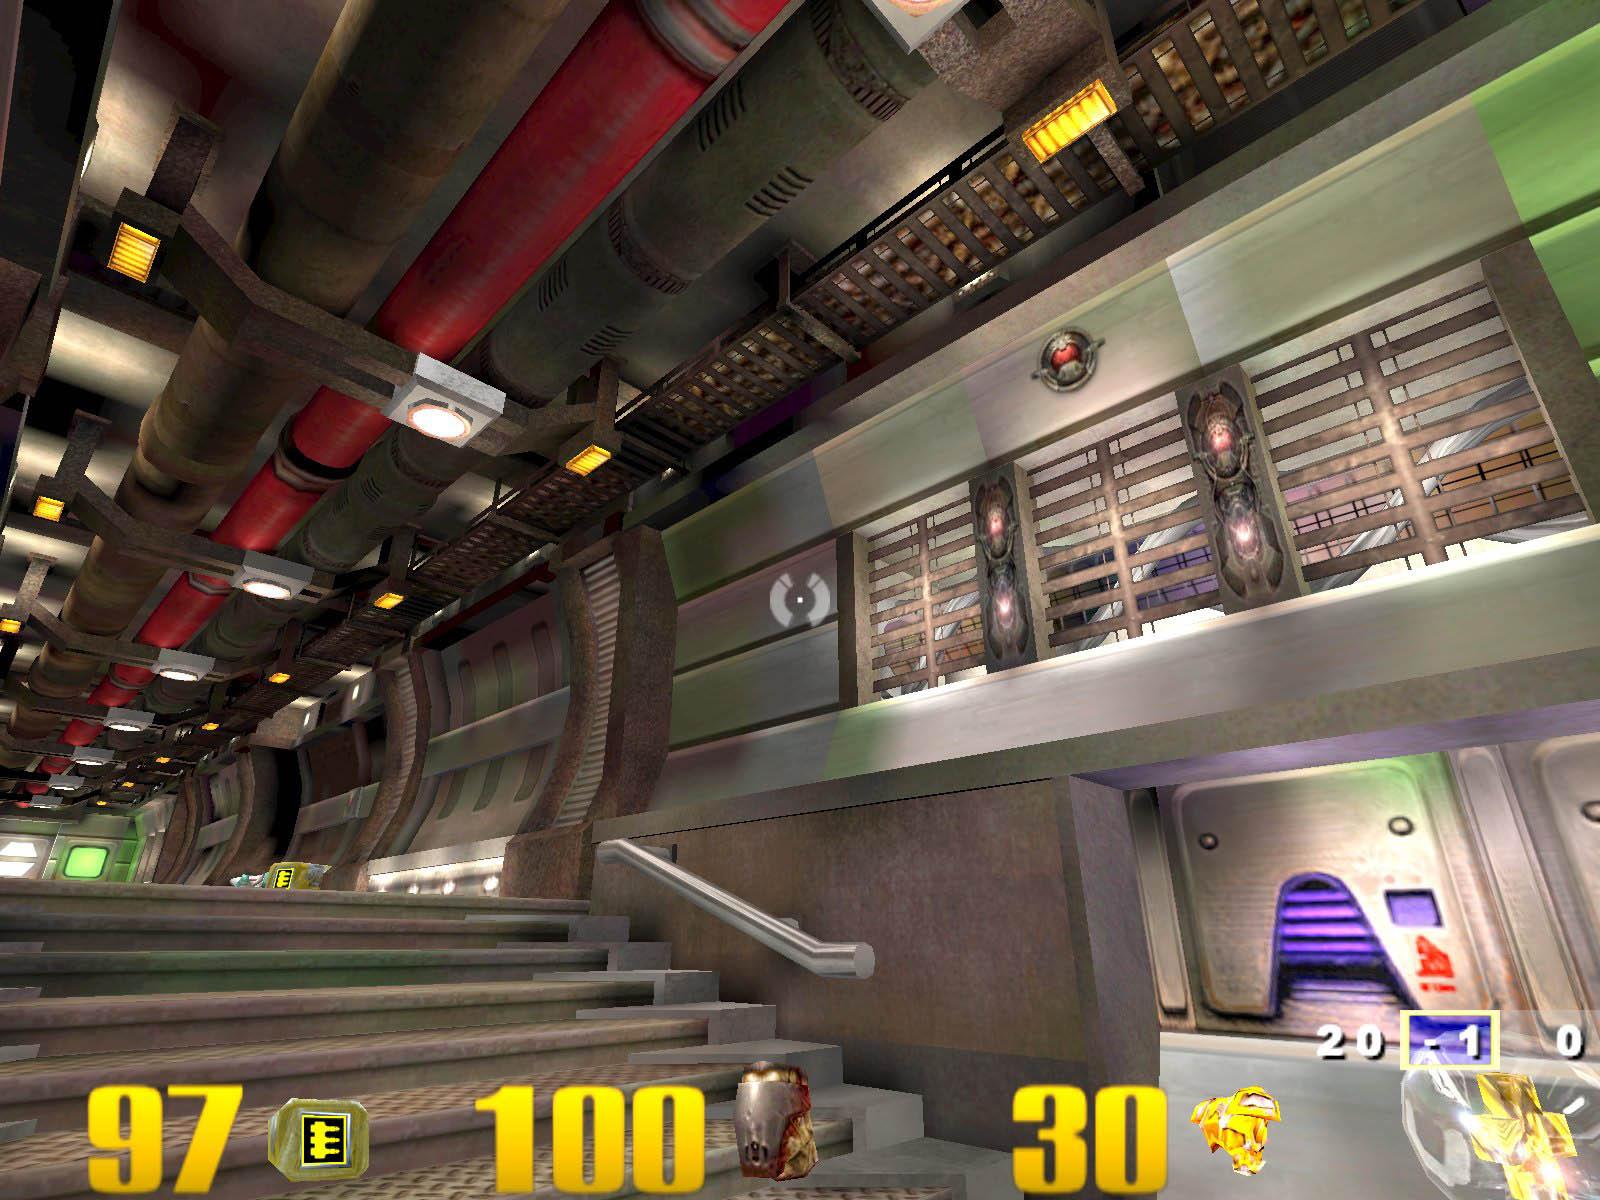 Quake 3 Arena image - id Tech 3 - Indie DB